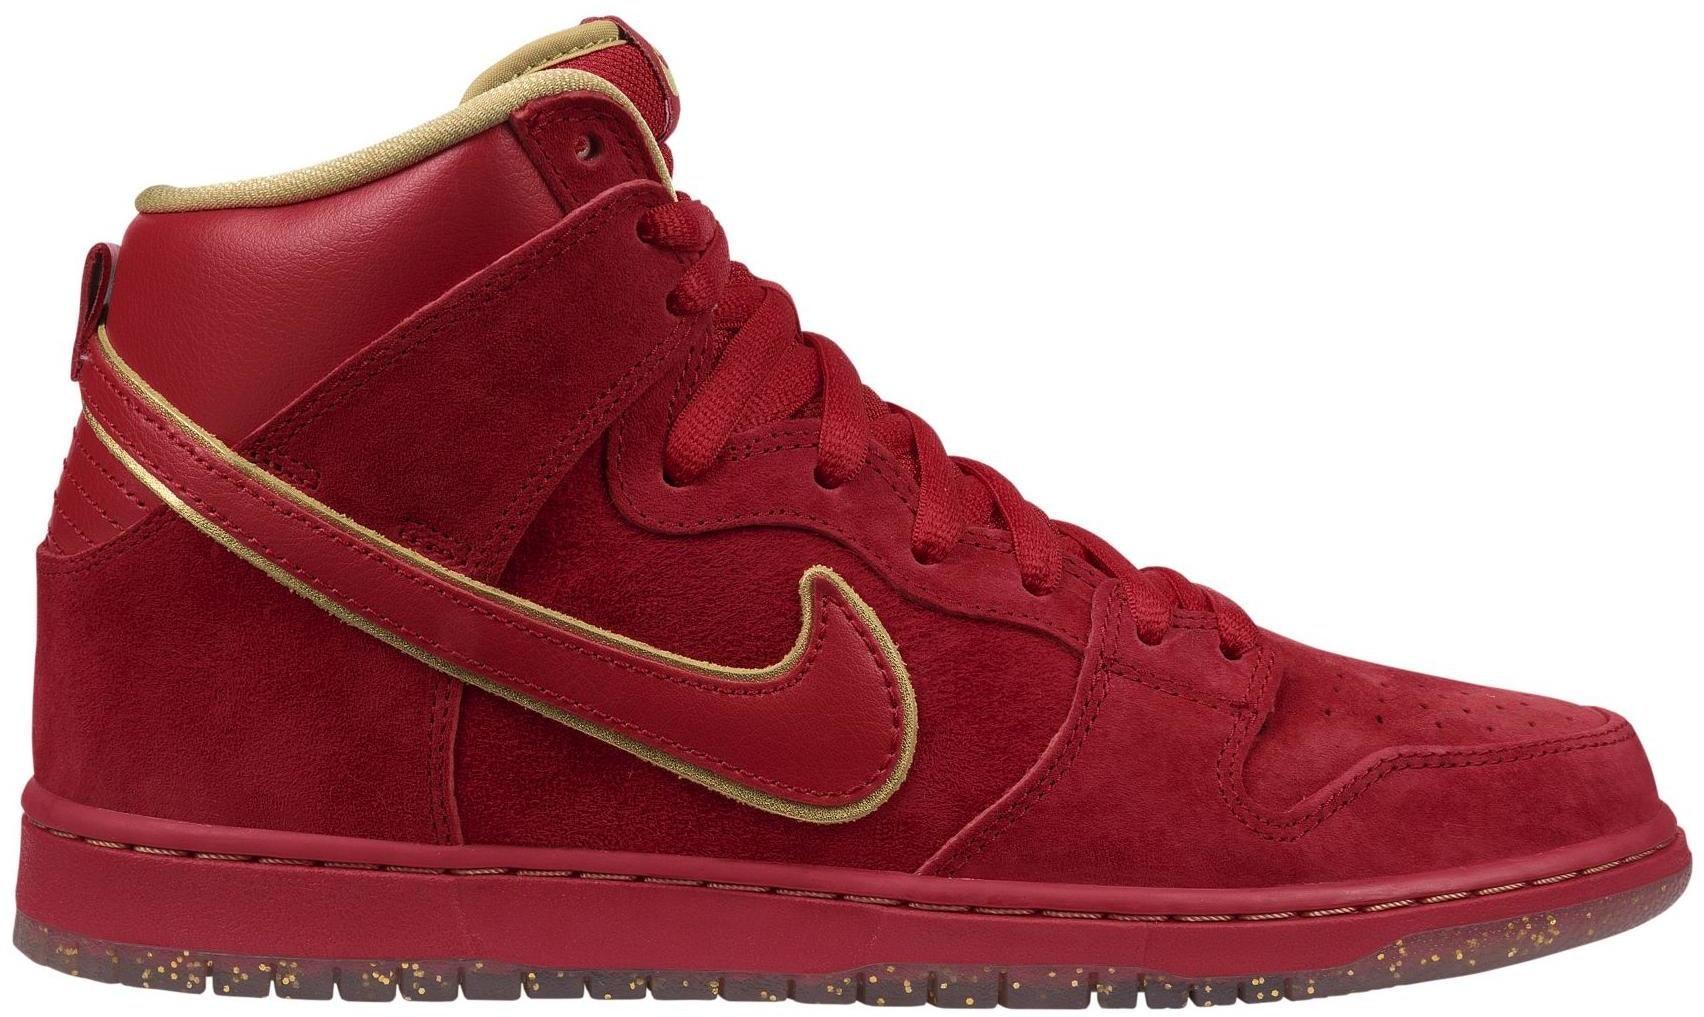 Nike Dunk SB High Chinese New Year (CNY)